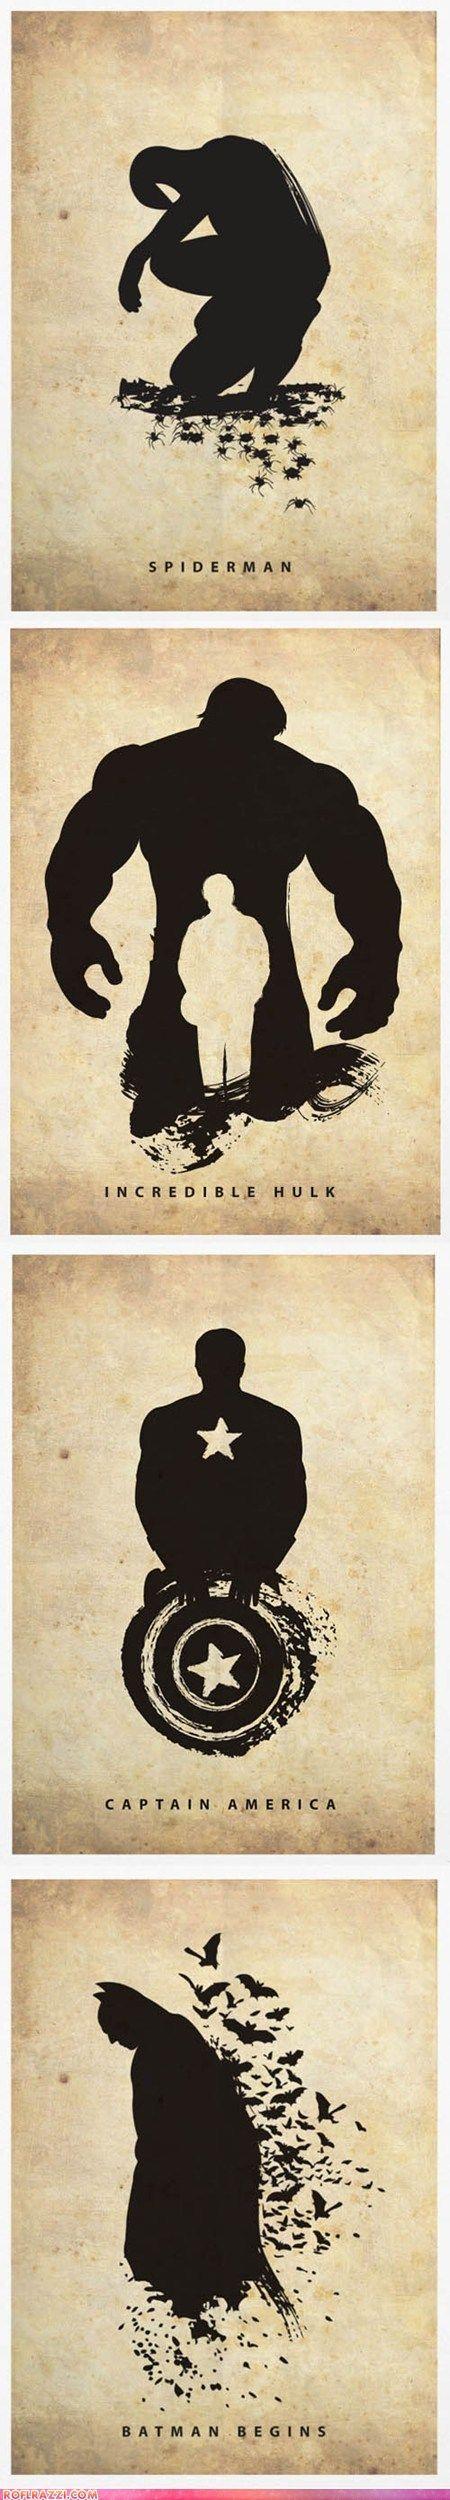 comic book silhouettes